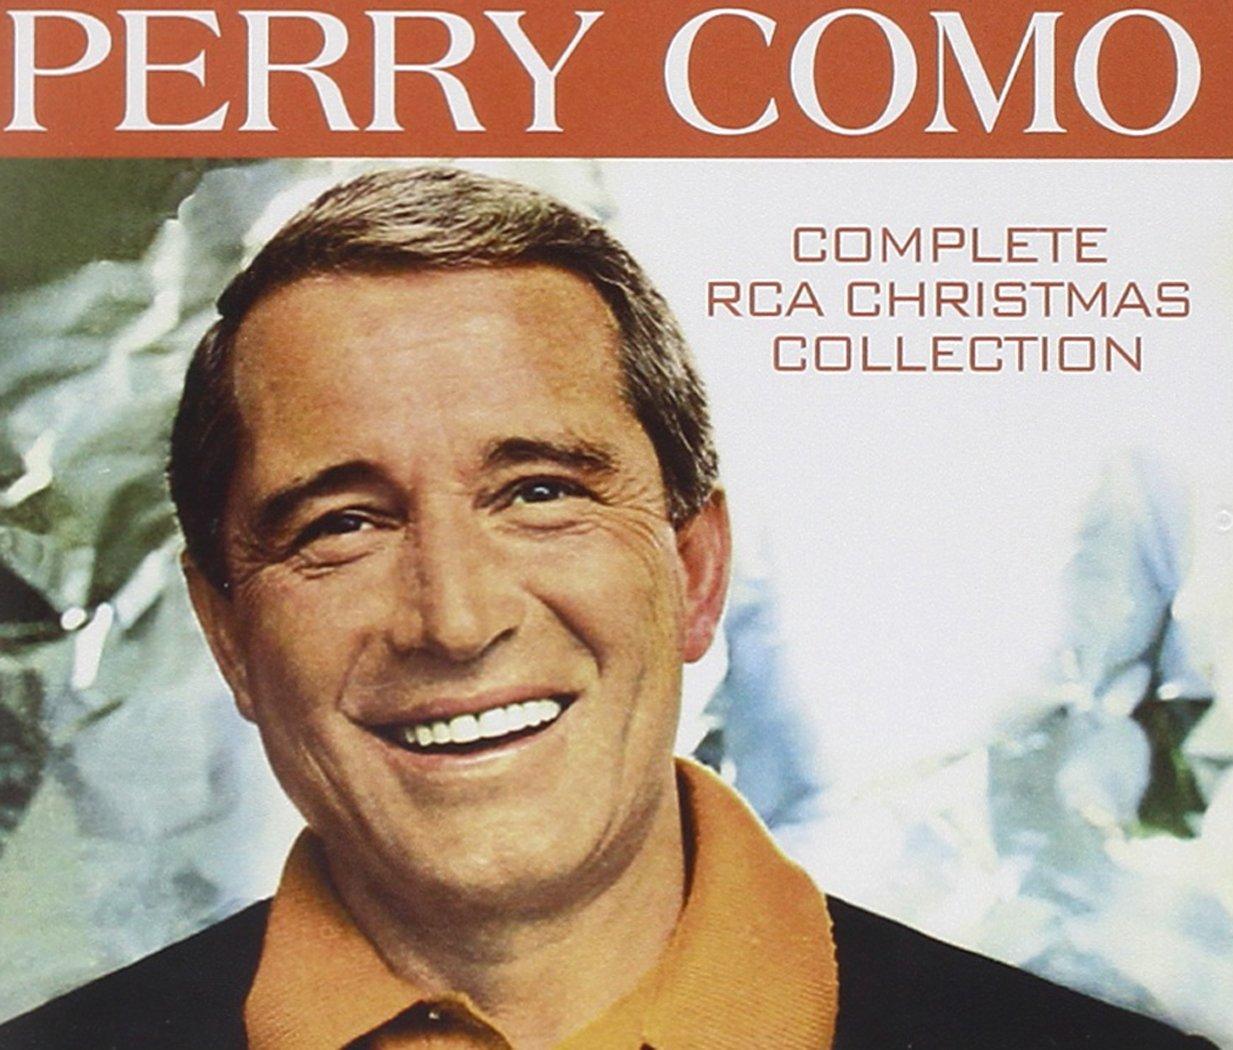 Perry Como - The Complete RCA Christmas Collection - Amazon.com Music